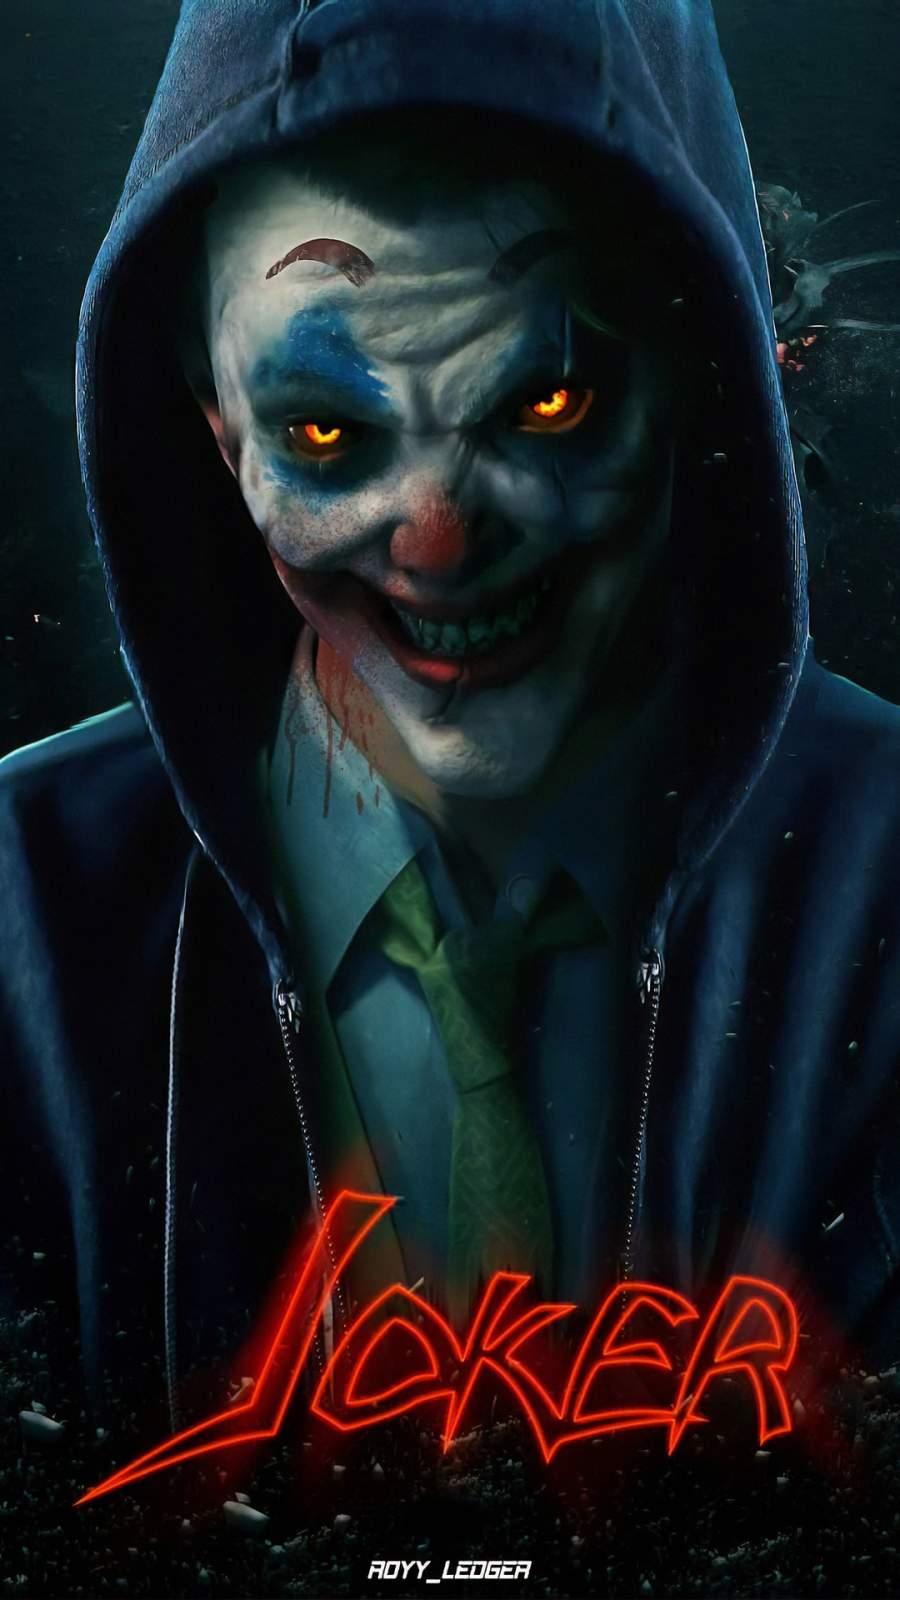 Scary Joker iPhone Wallpaper